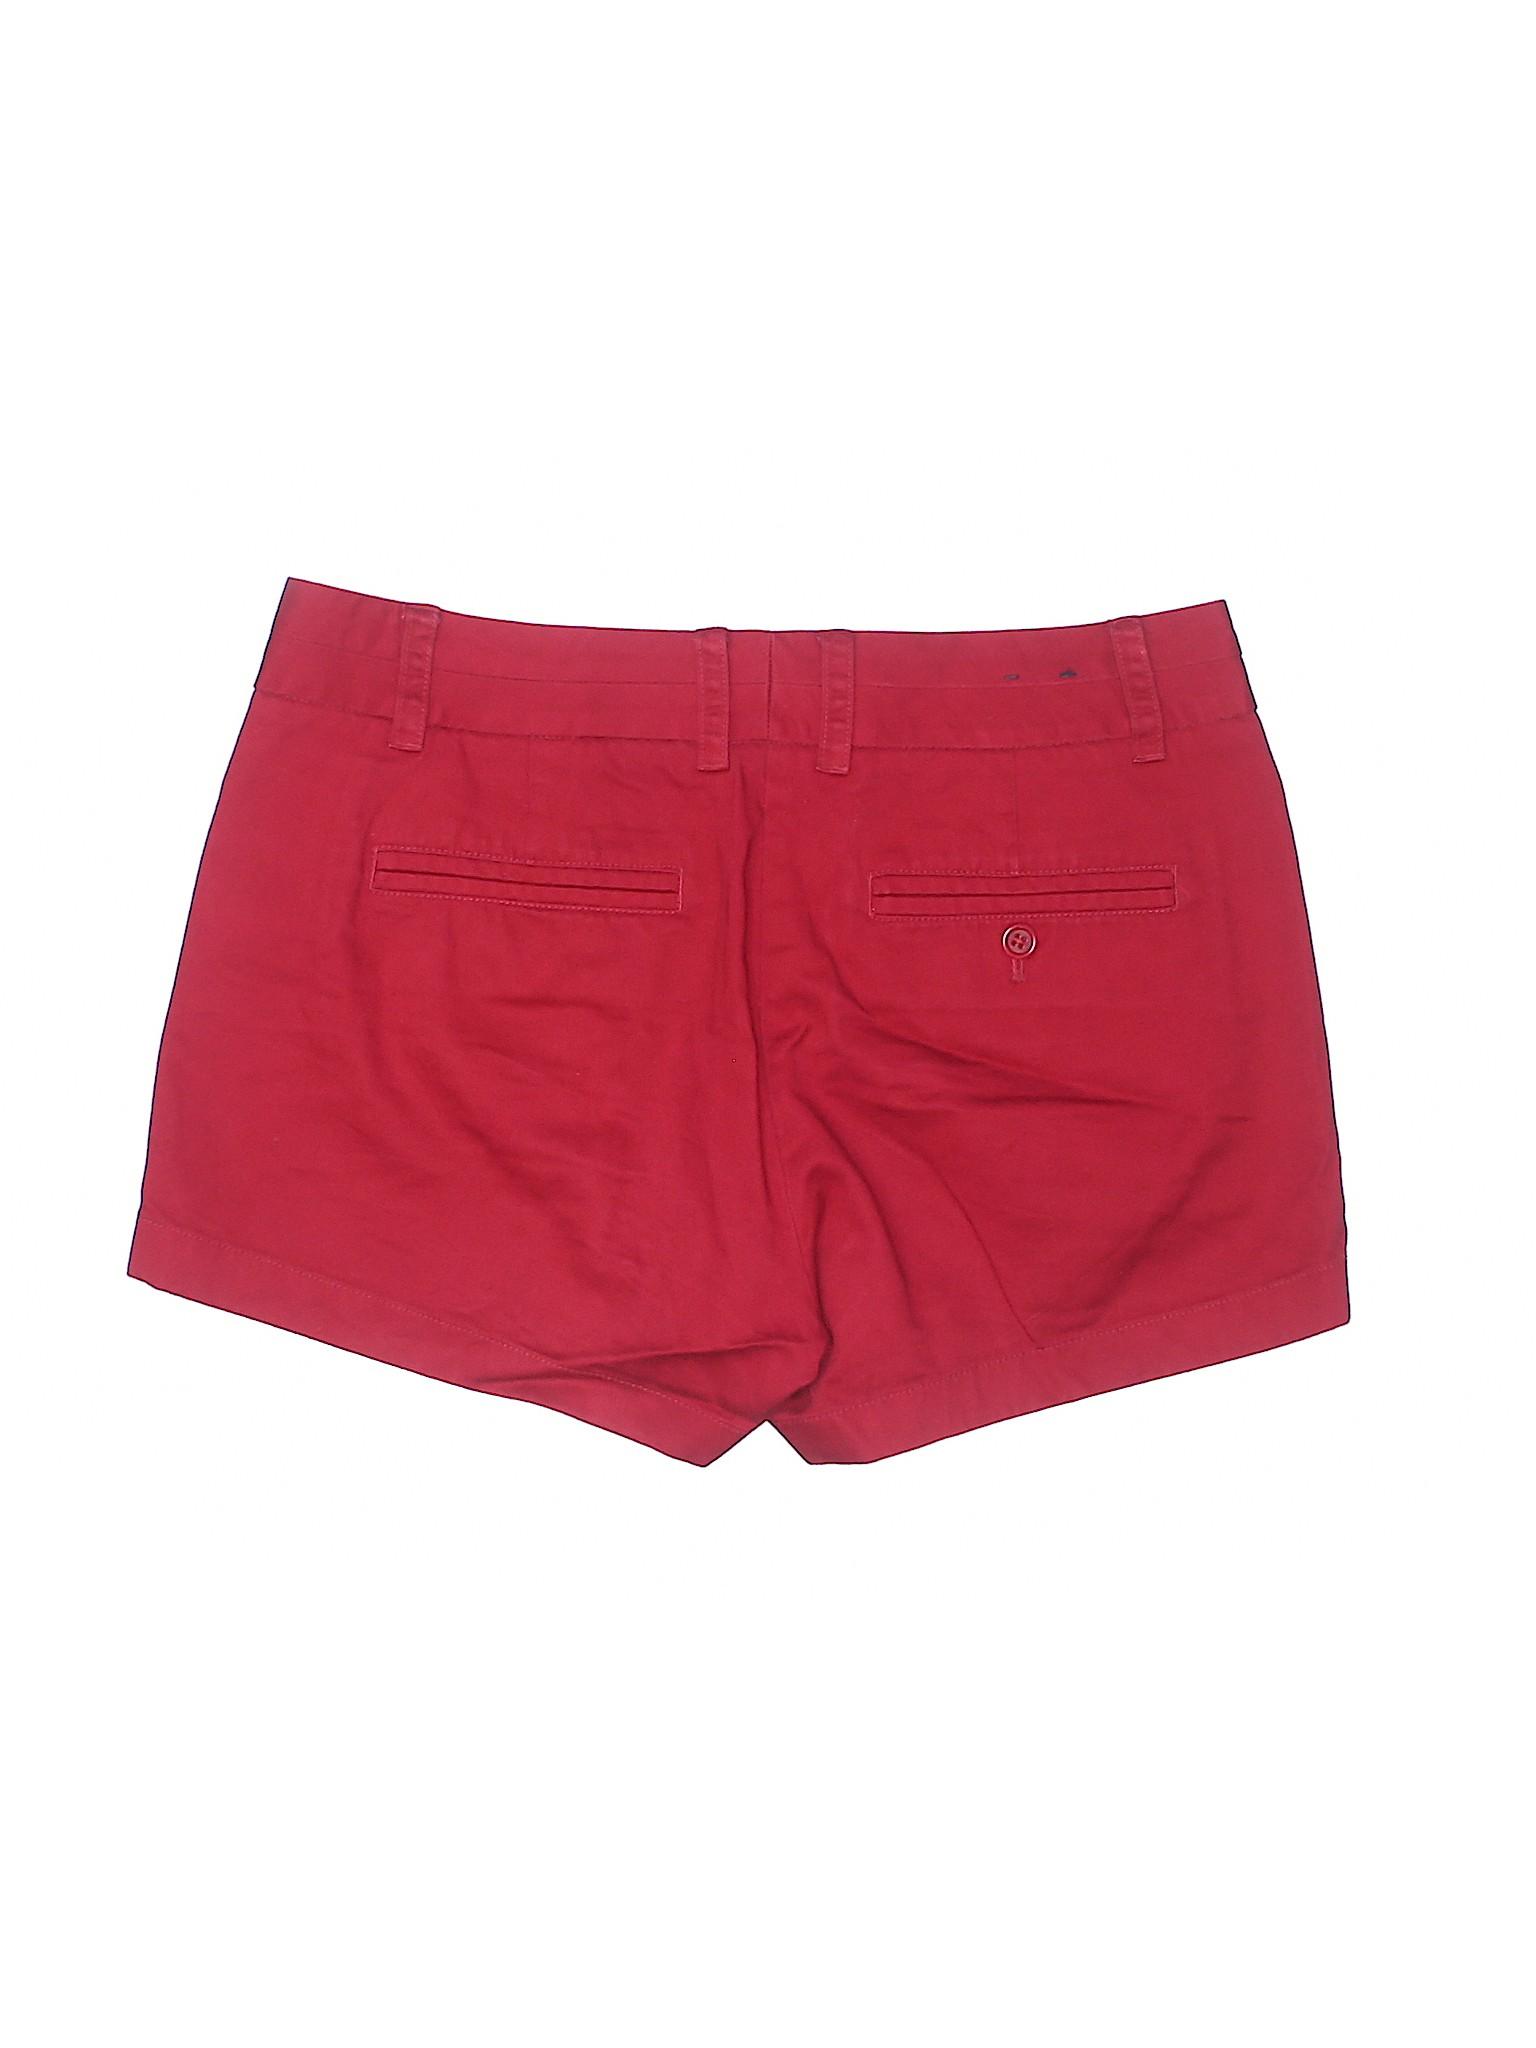 leisure Khaki J Boutique Crew Shorts Rv7c6c0OF